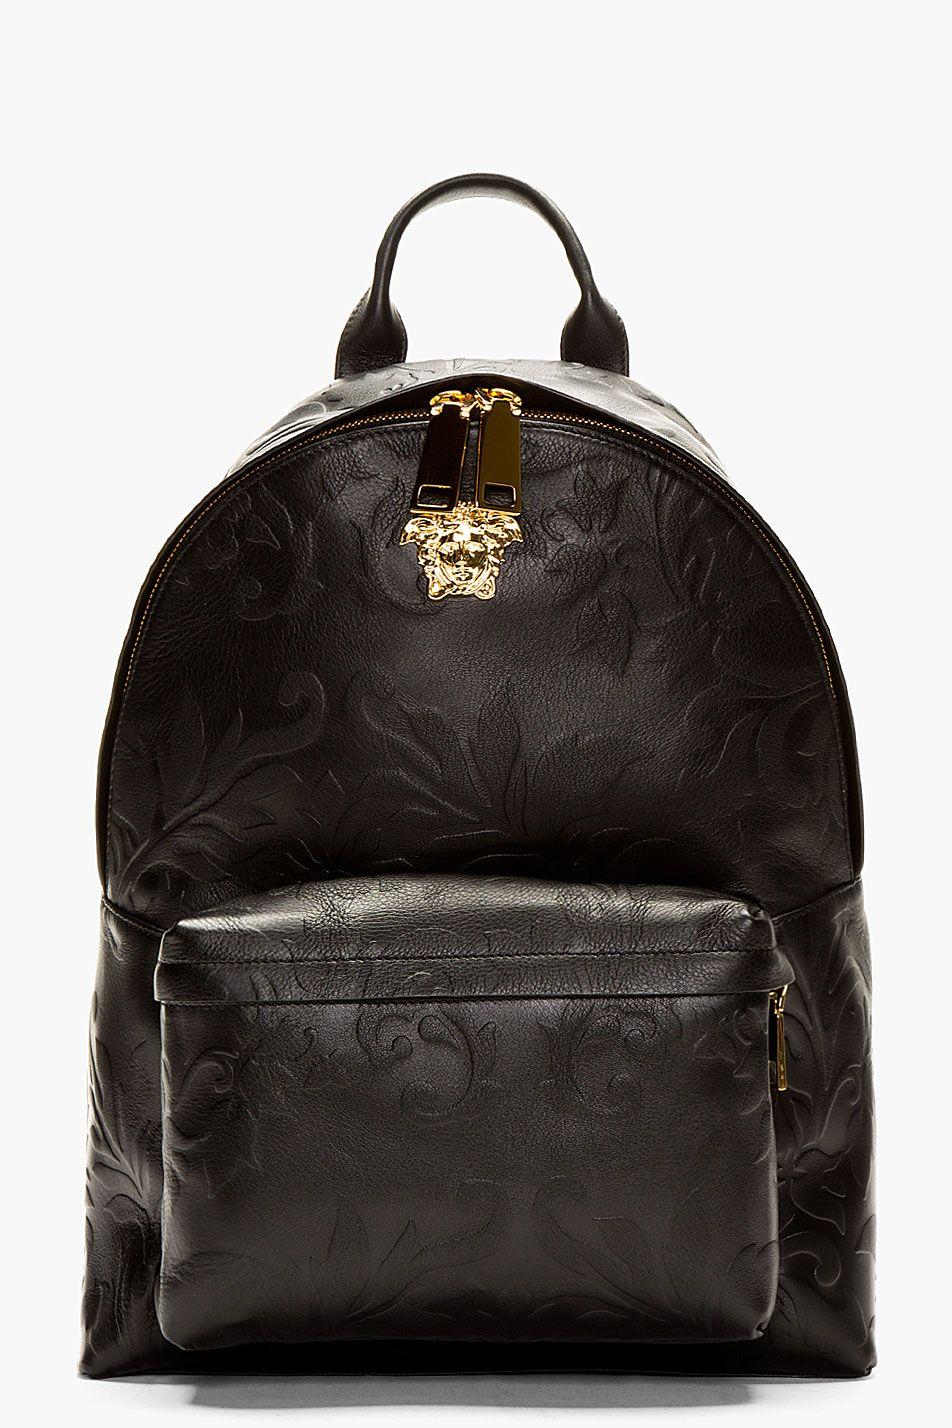 Versace black embossed grain leather emblem backpack